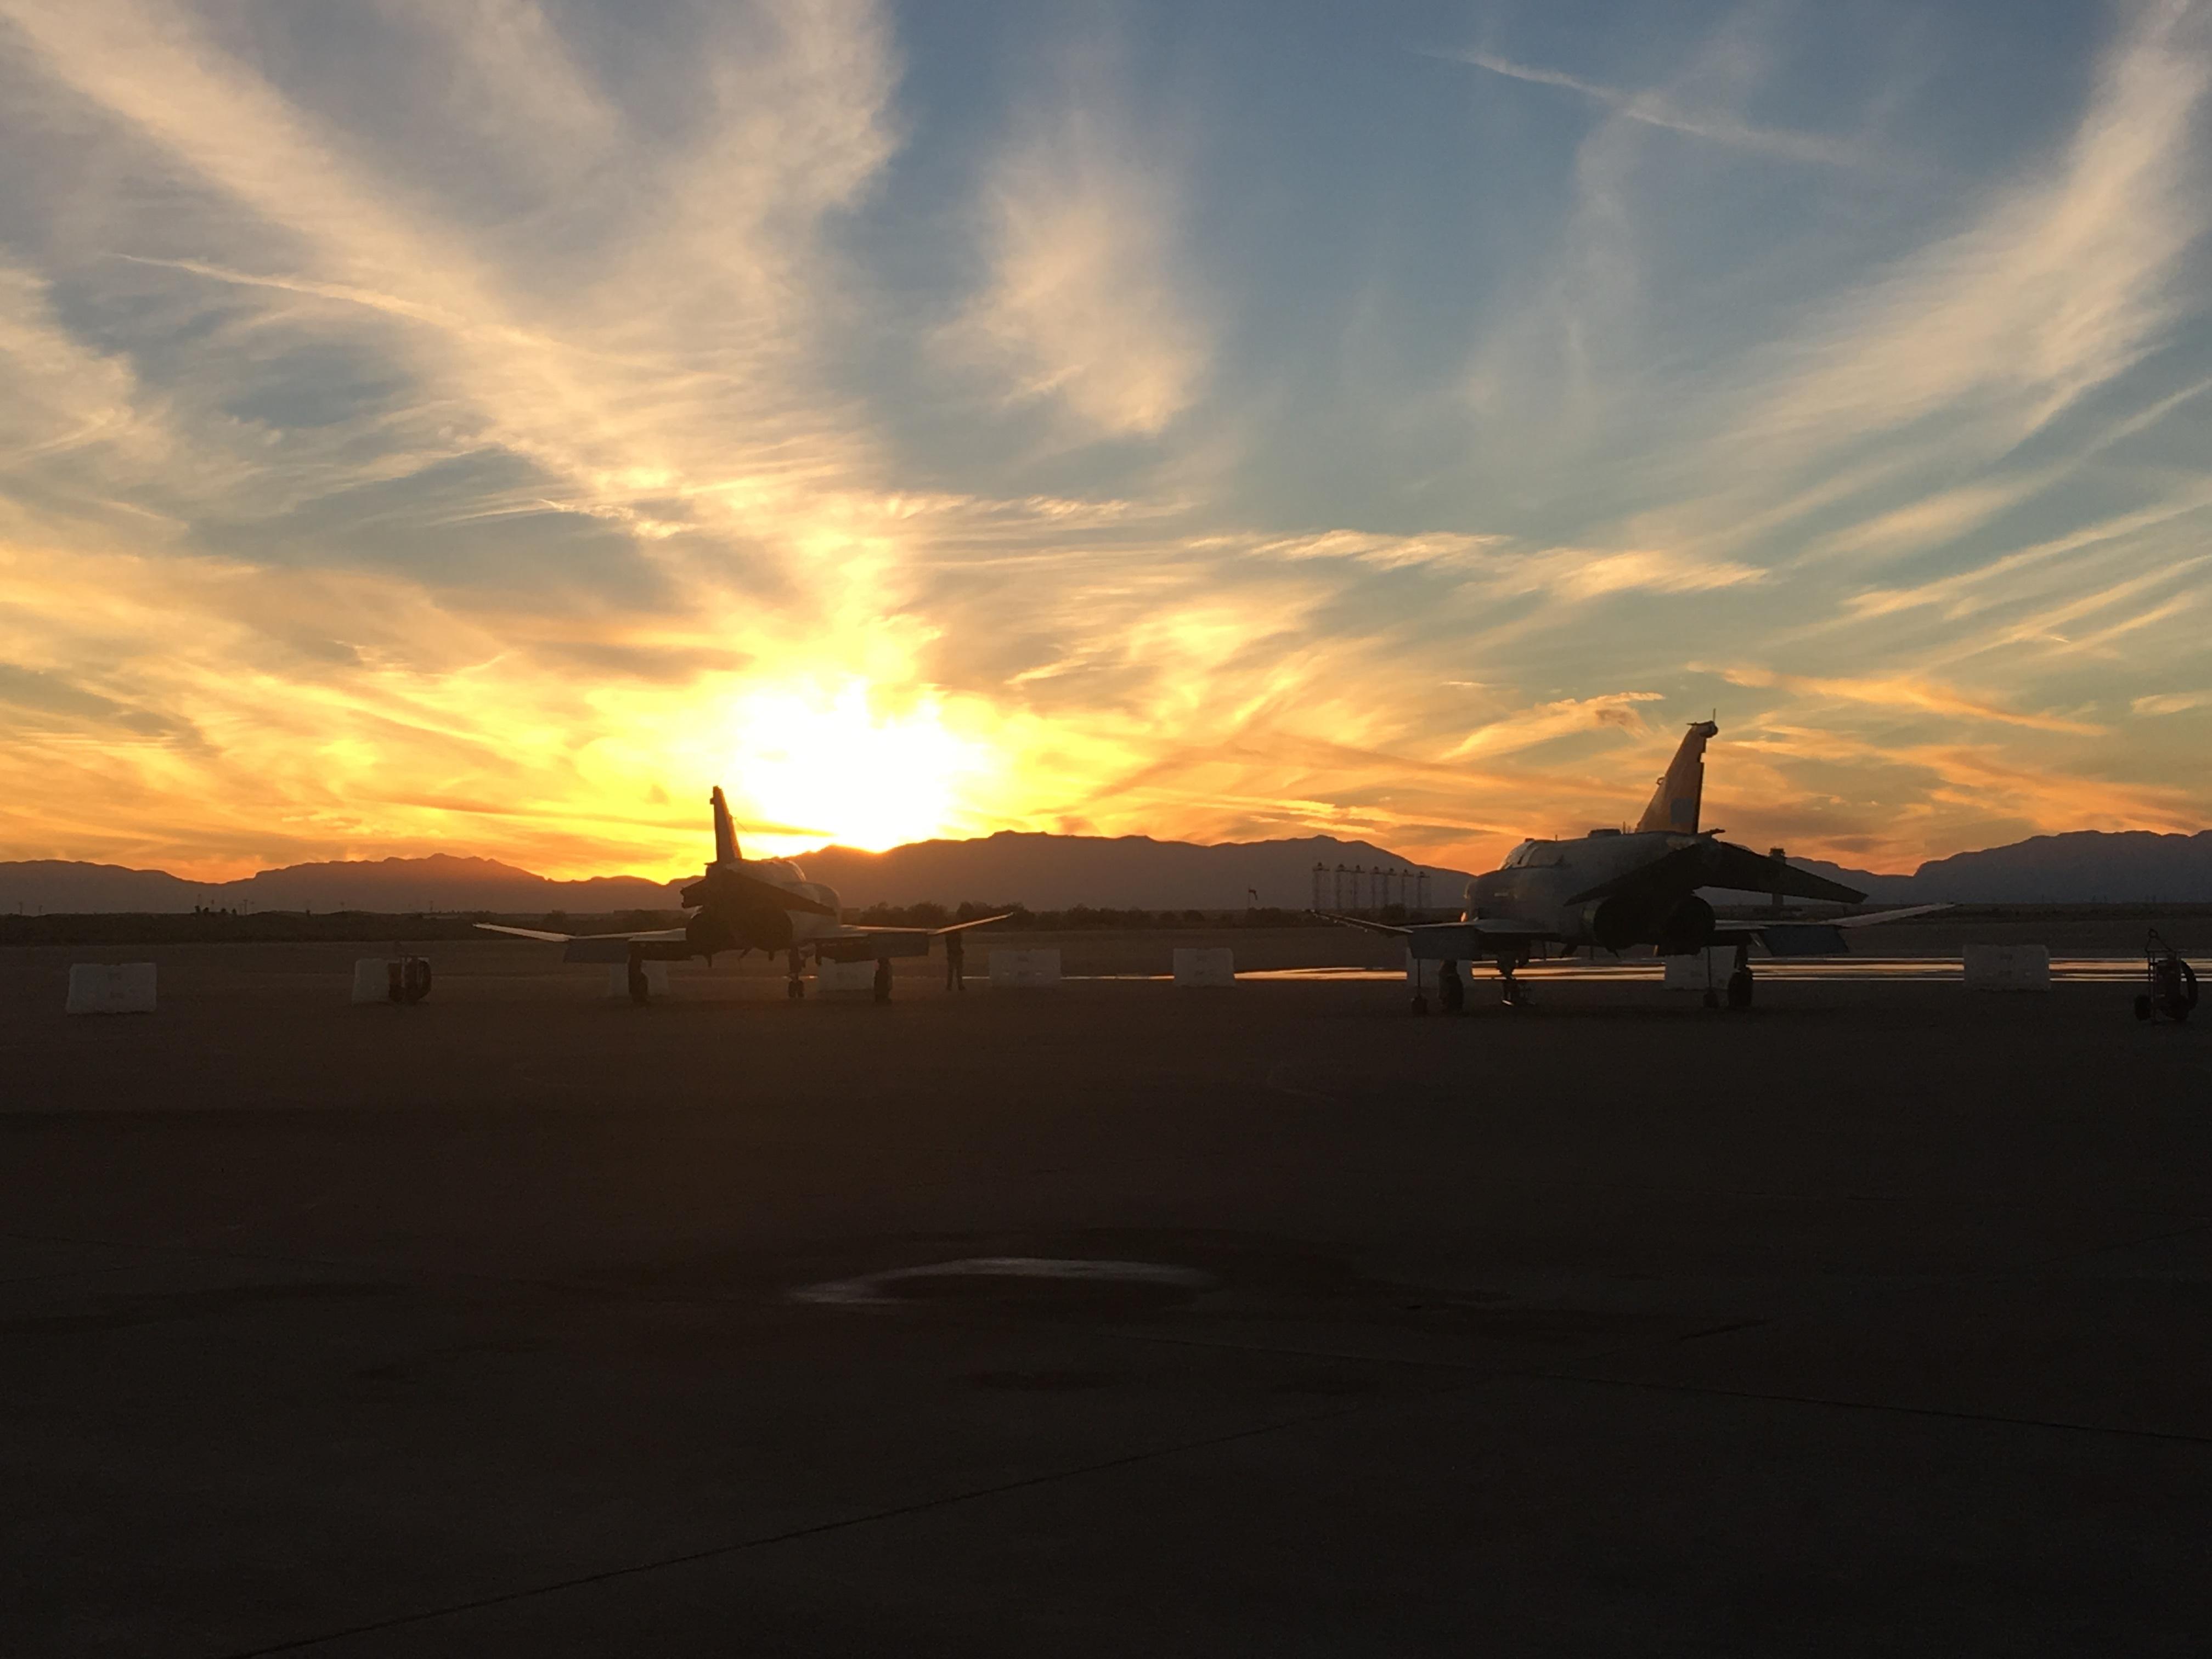 Click image for larger version  Name:Sunset Phantoms.jpg Views:1022 Size:1.08 MB ID:2195503